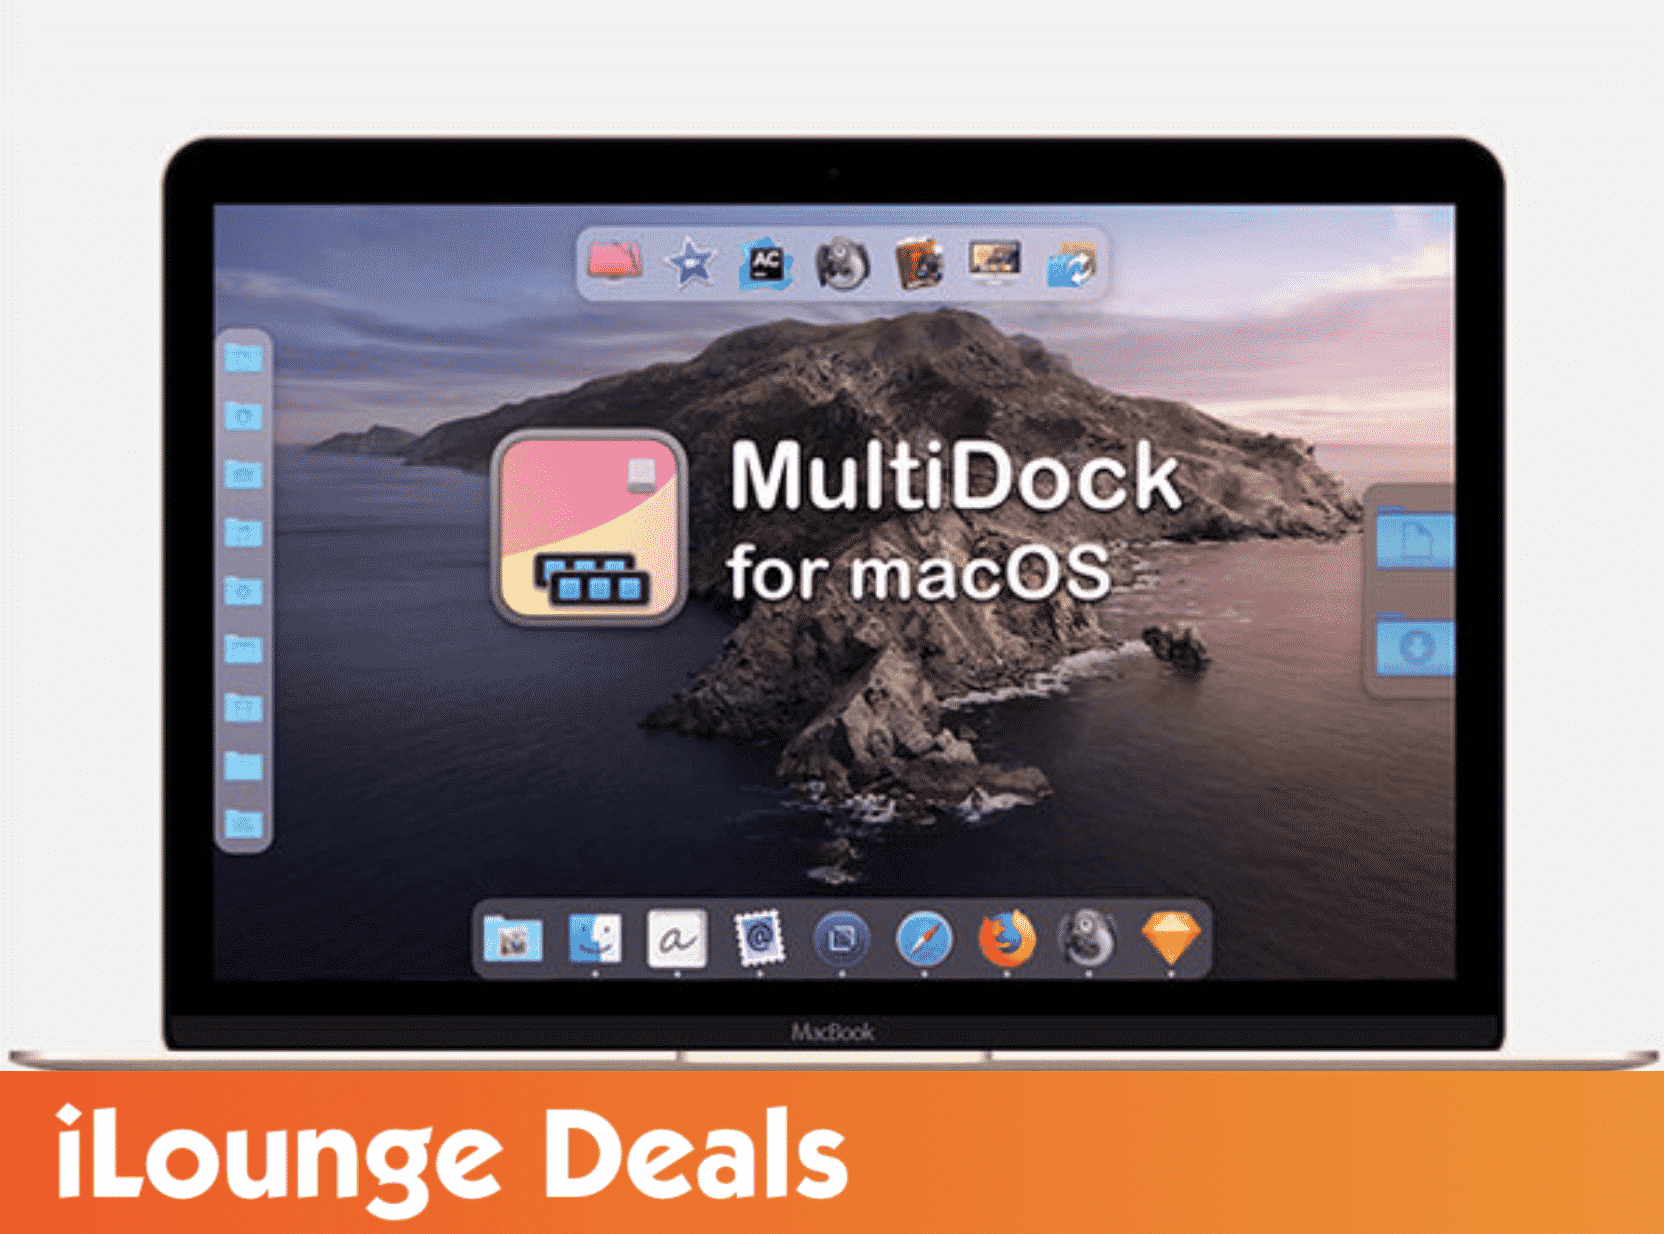 MultiDock for Mac